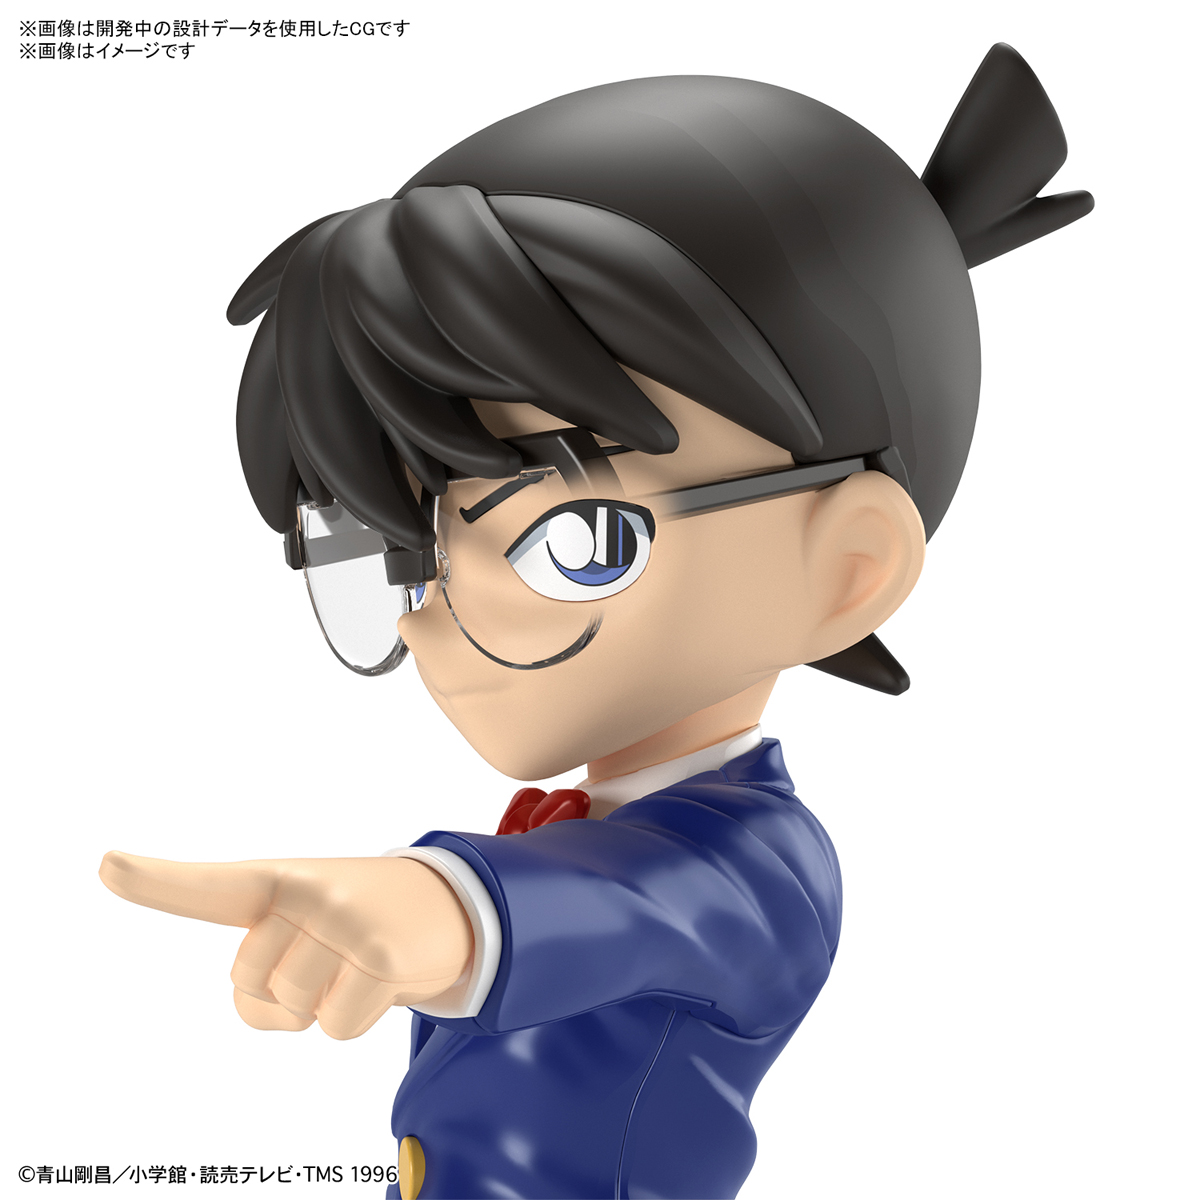 ENTRY GRADE『江戸川コナン』名探偵コナン プラモデル-003